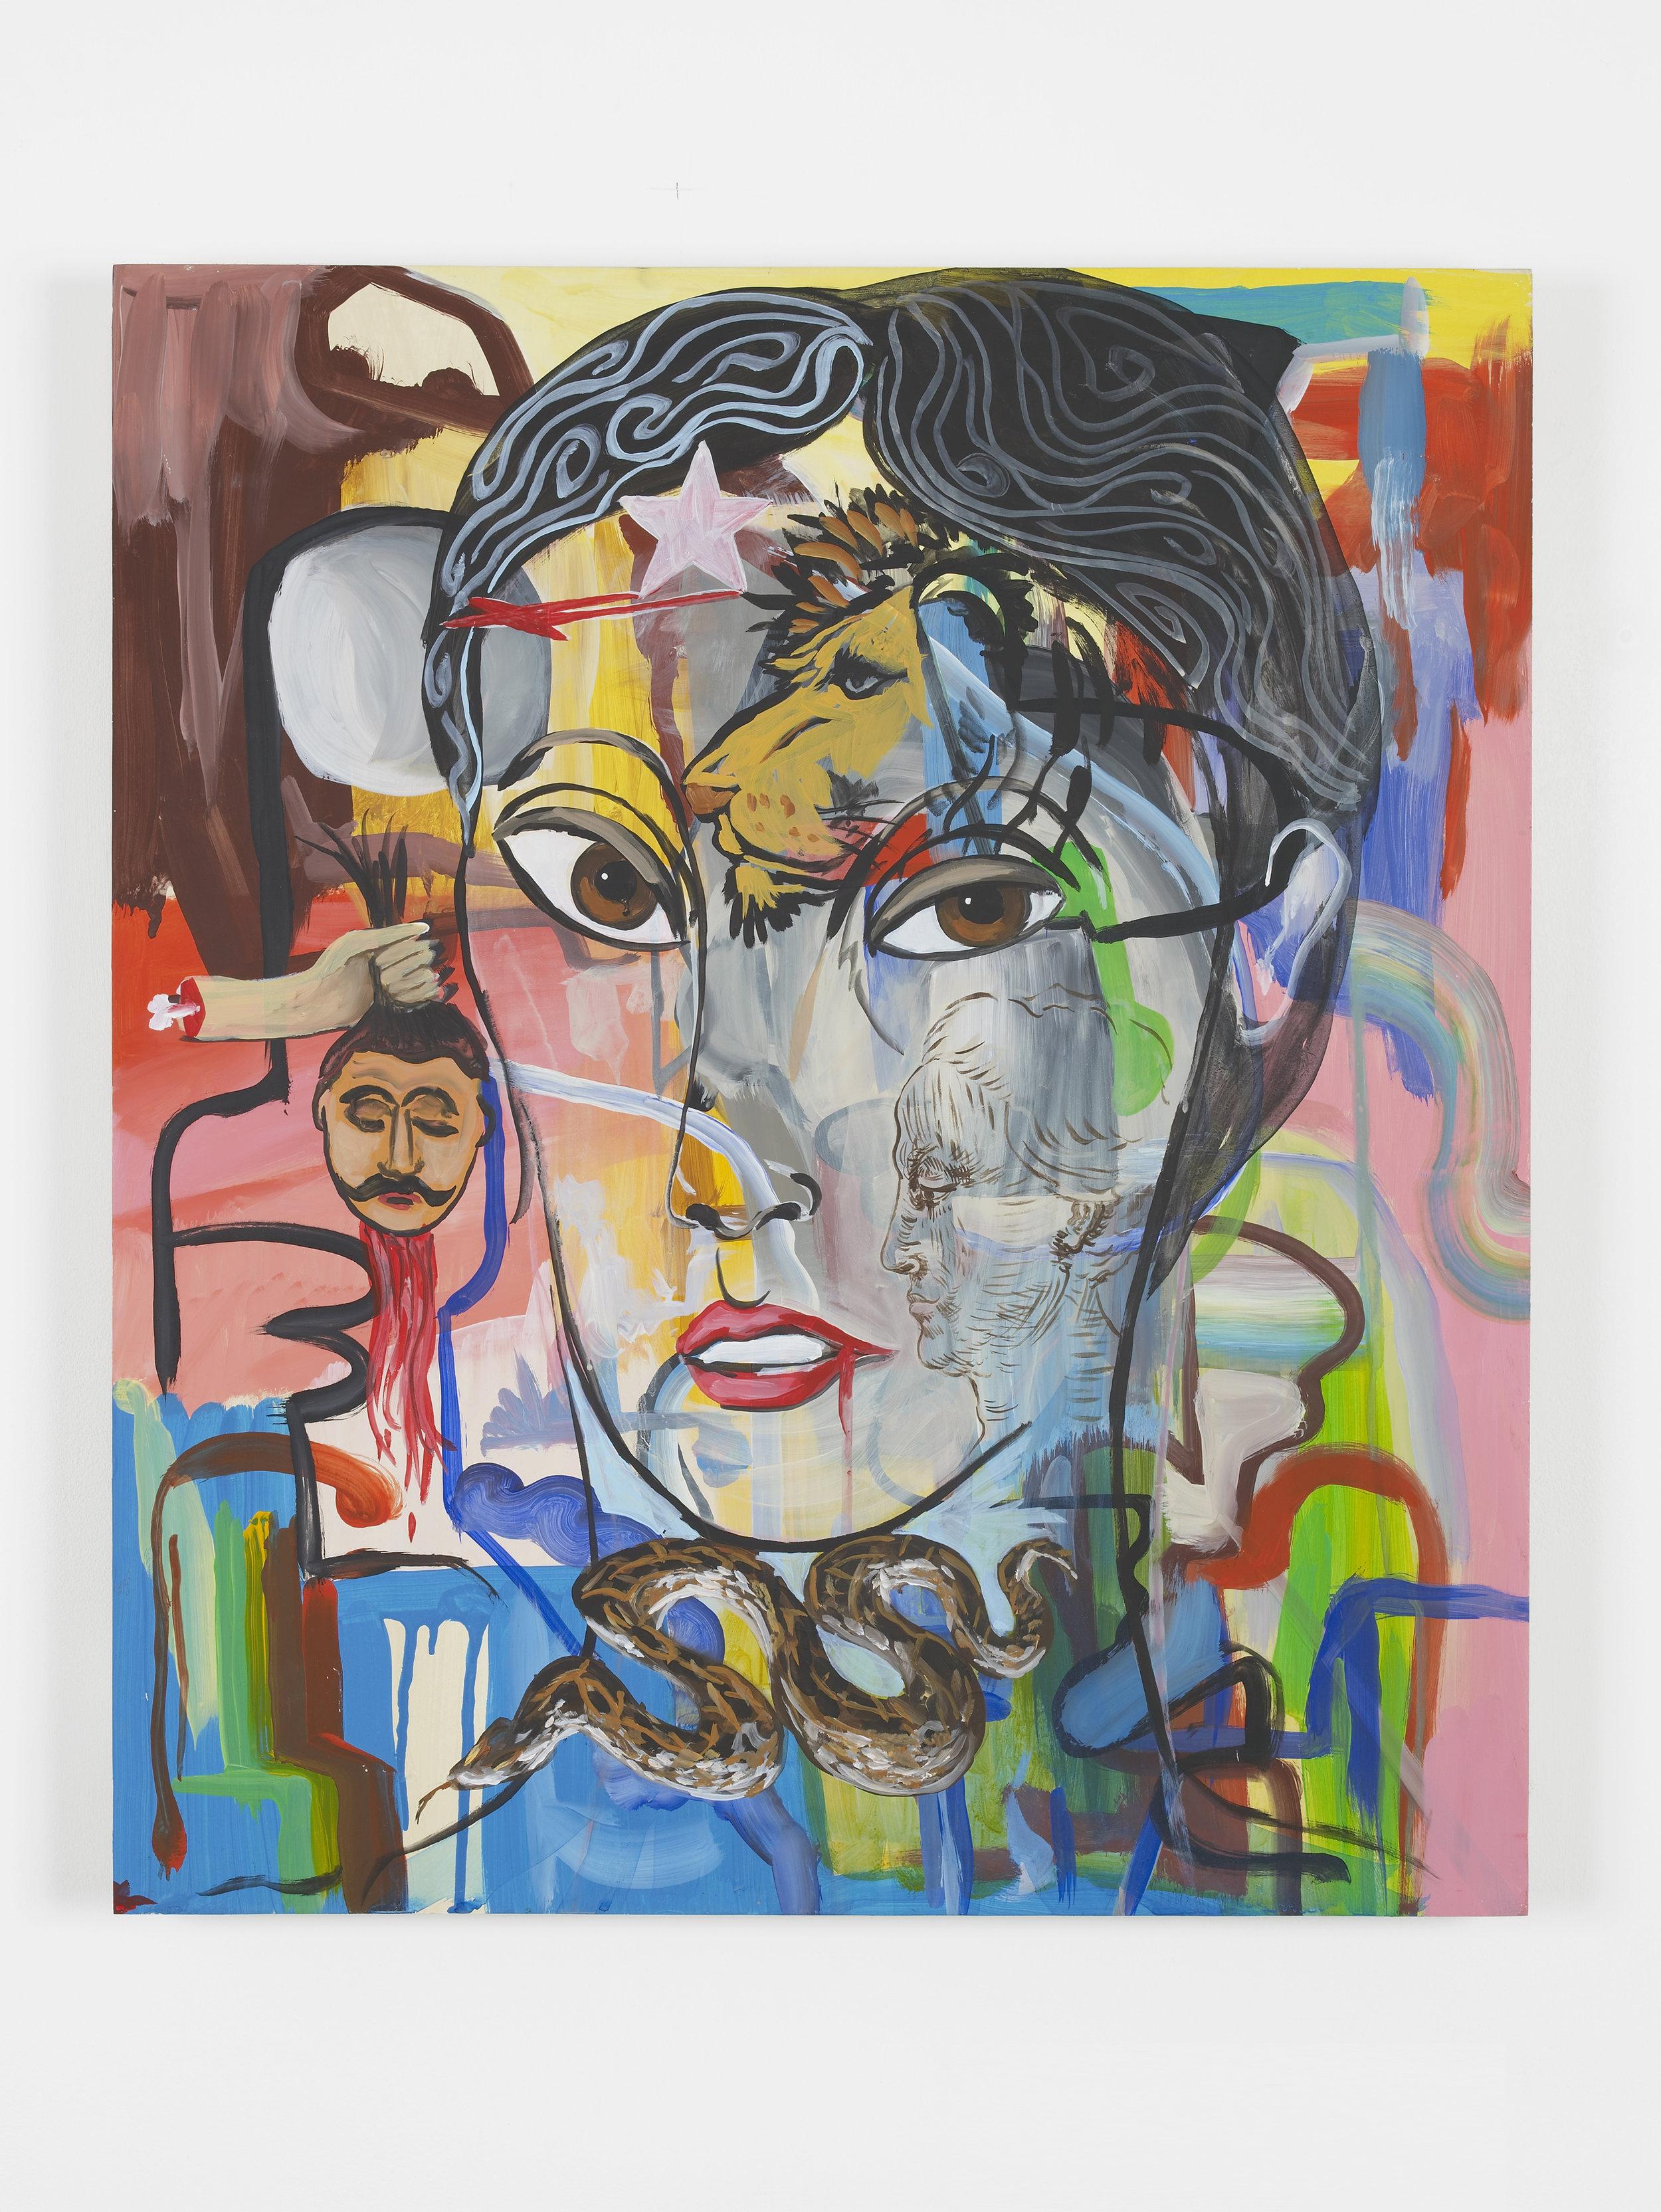 Post-revolutionary Gaze  2017  Acrylic on wood  70 x 60 cm / 27.6 x 23.6 in